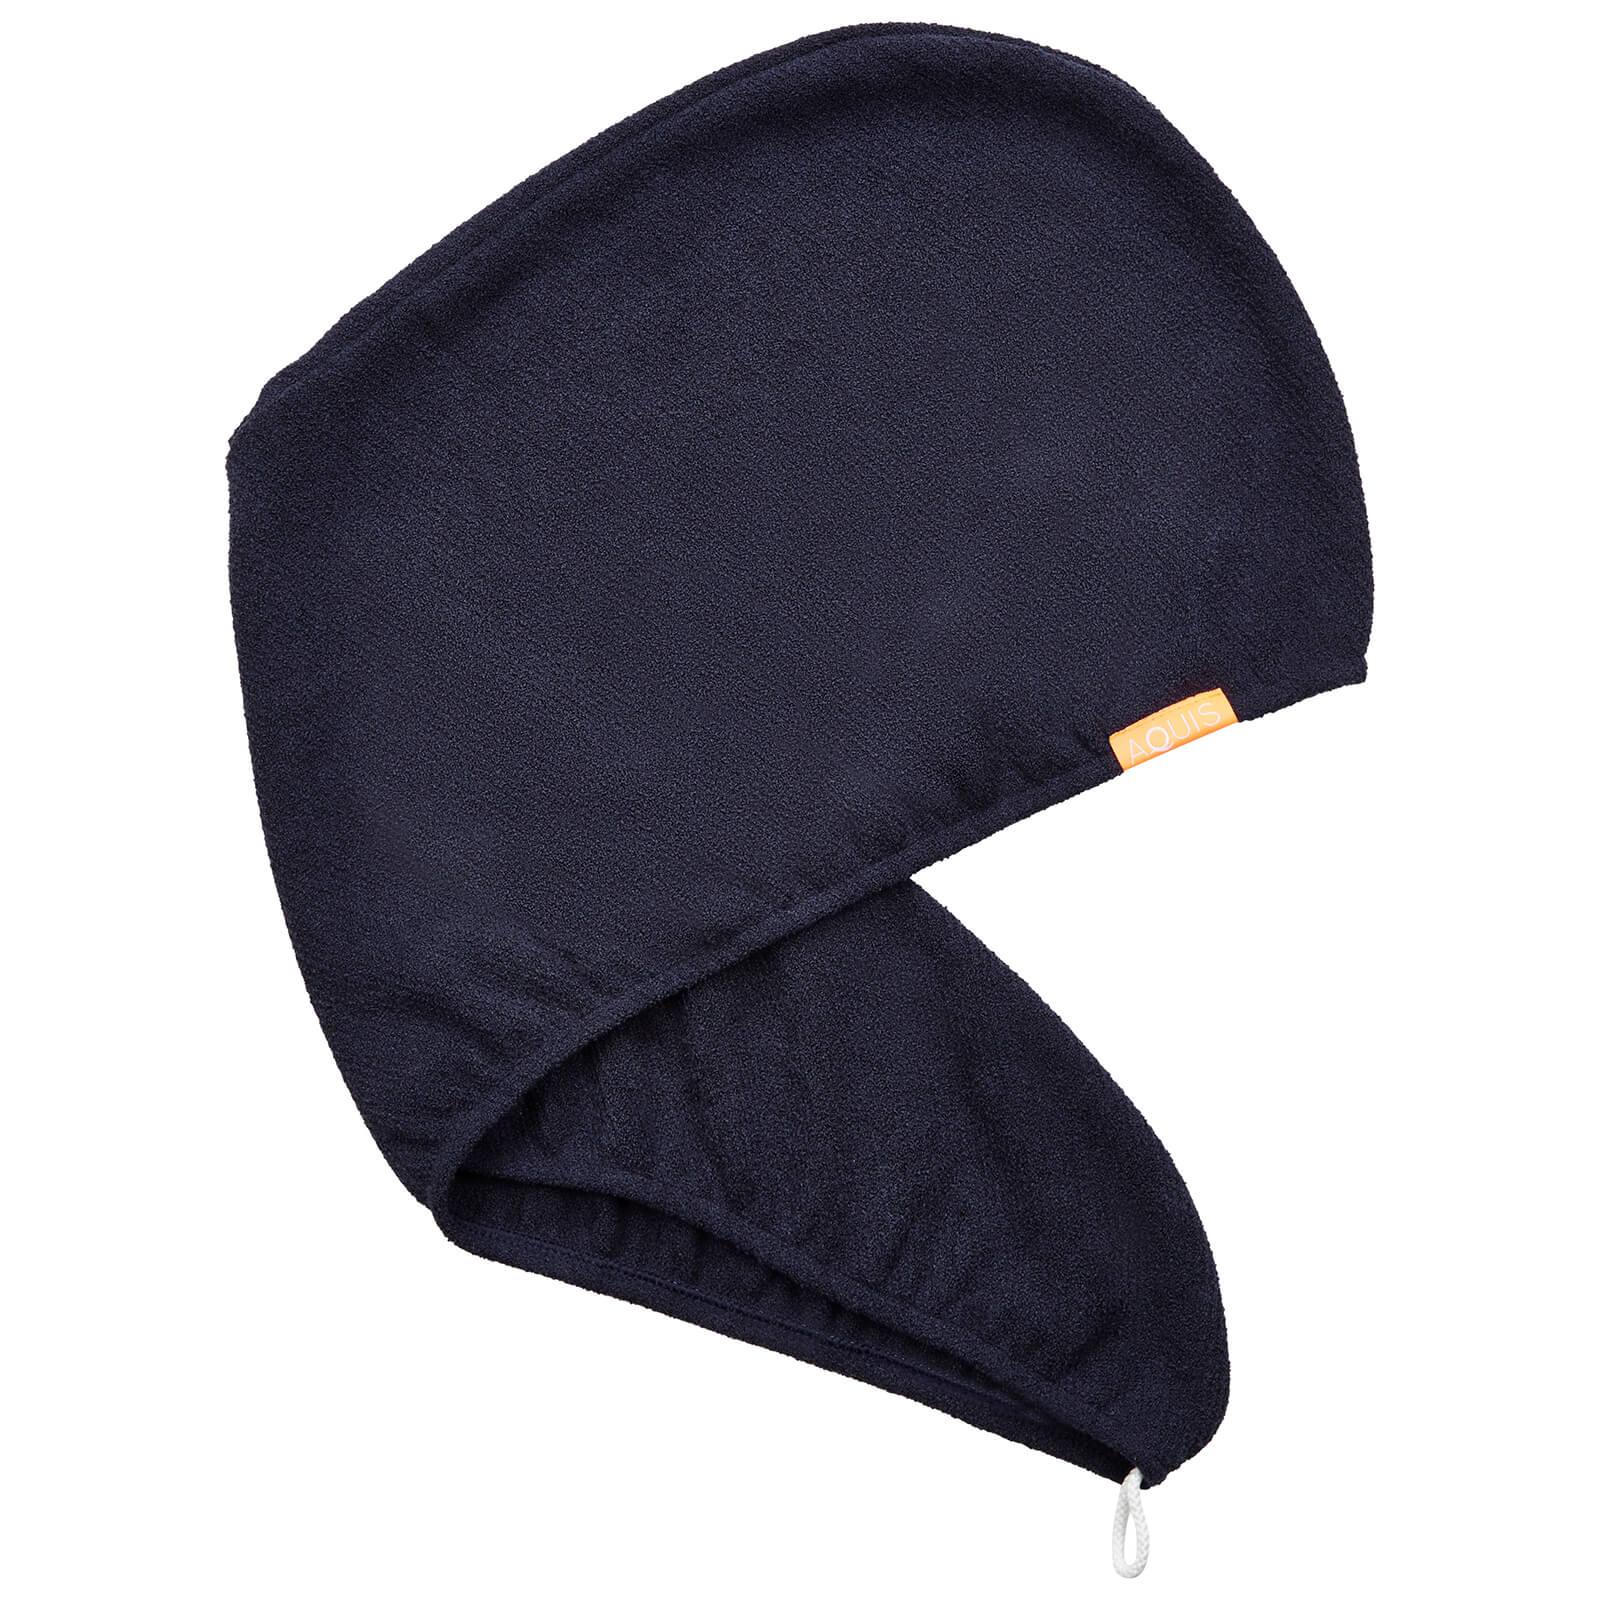 Тюрбан для сушки волос Aquis Lisse Luxe Hair Turban — Stormy Sky  - Купить